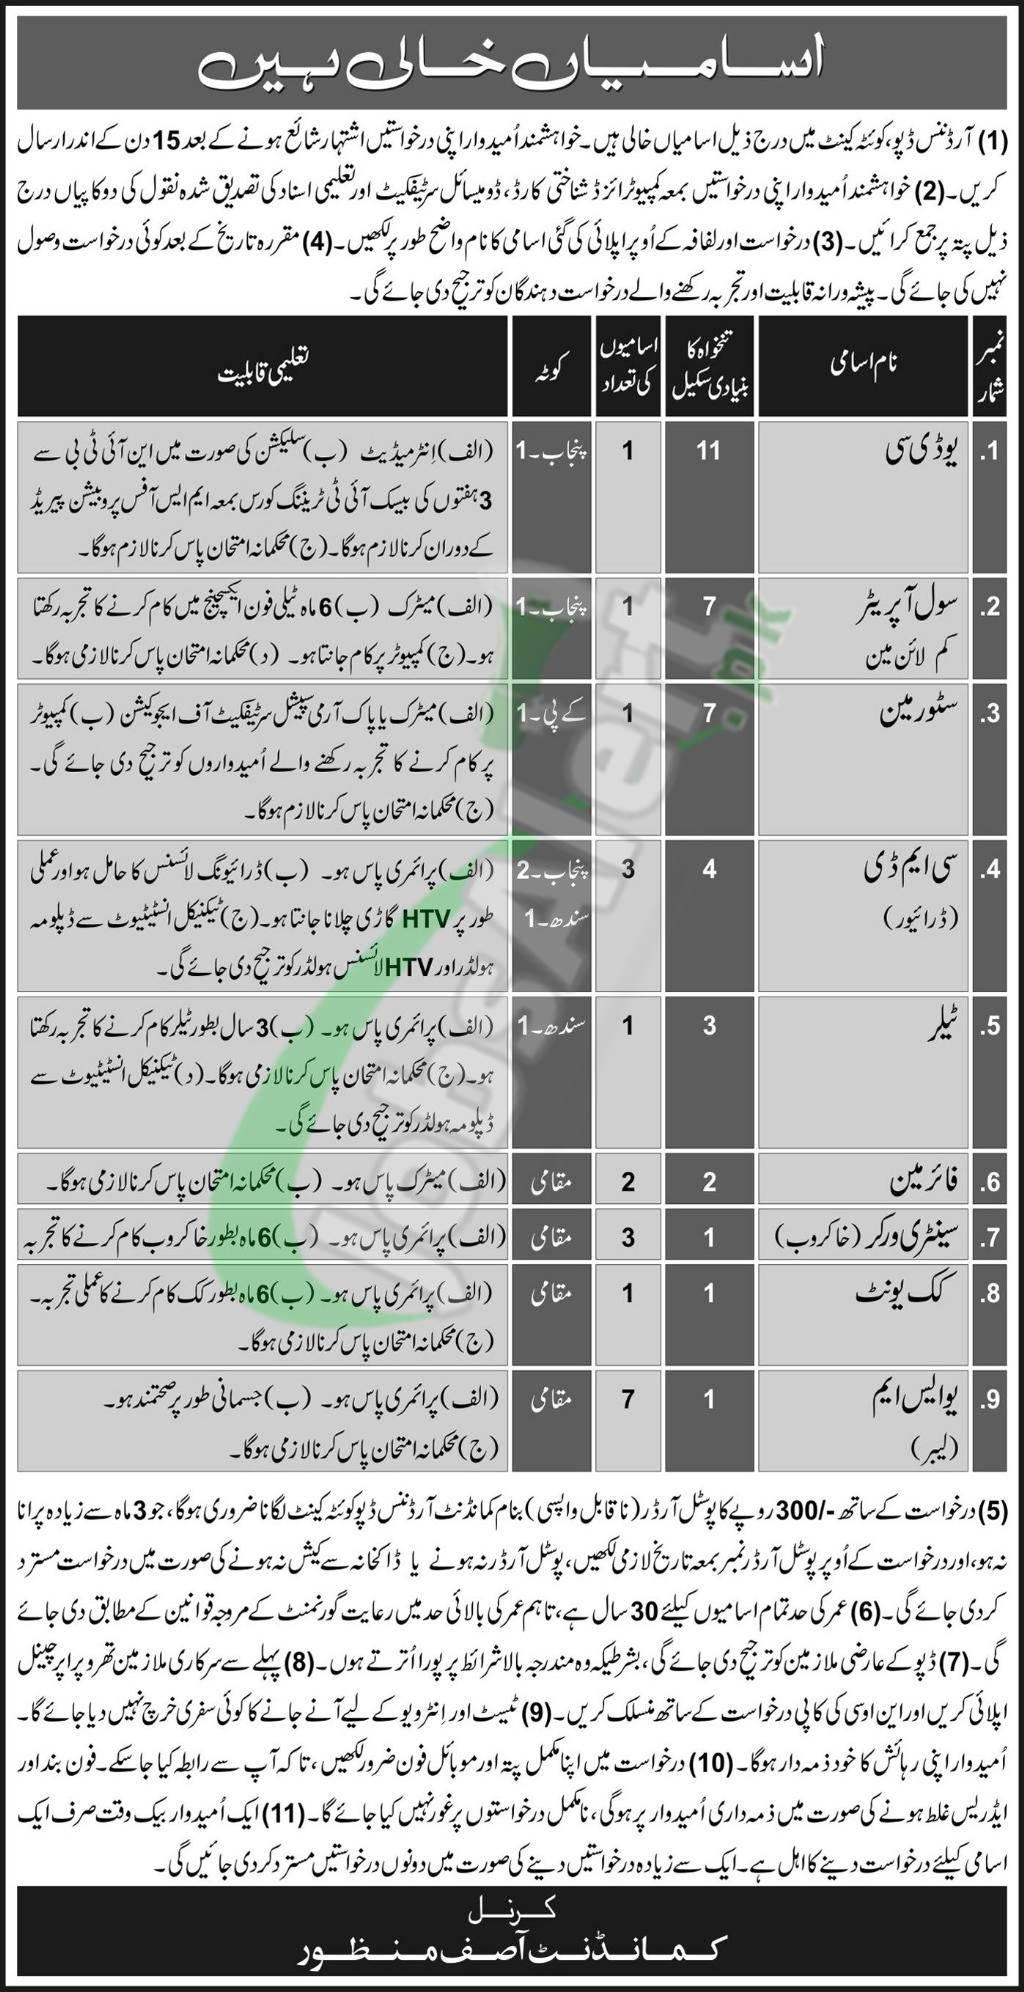 Pakistan Army Jobs 2018